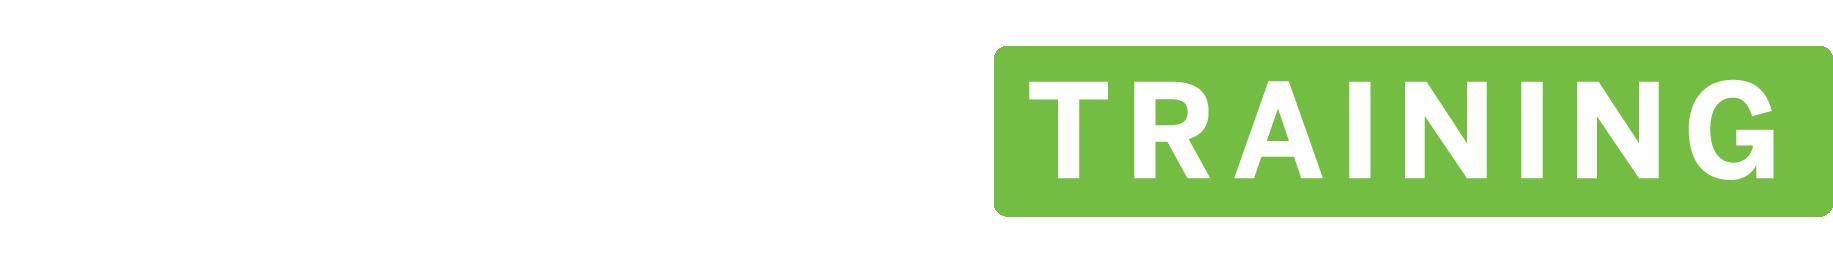 DRVR Training